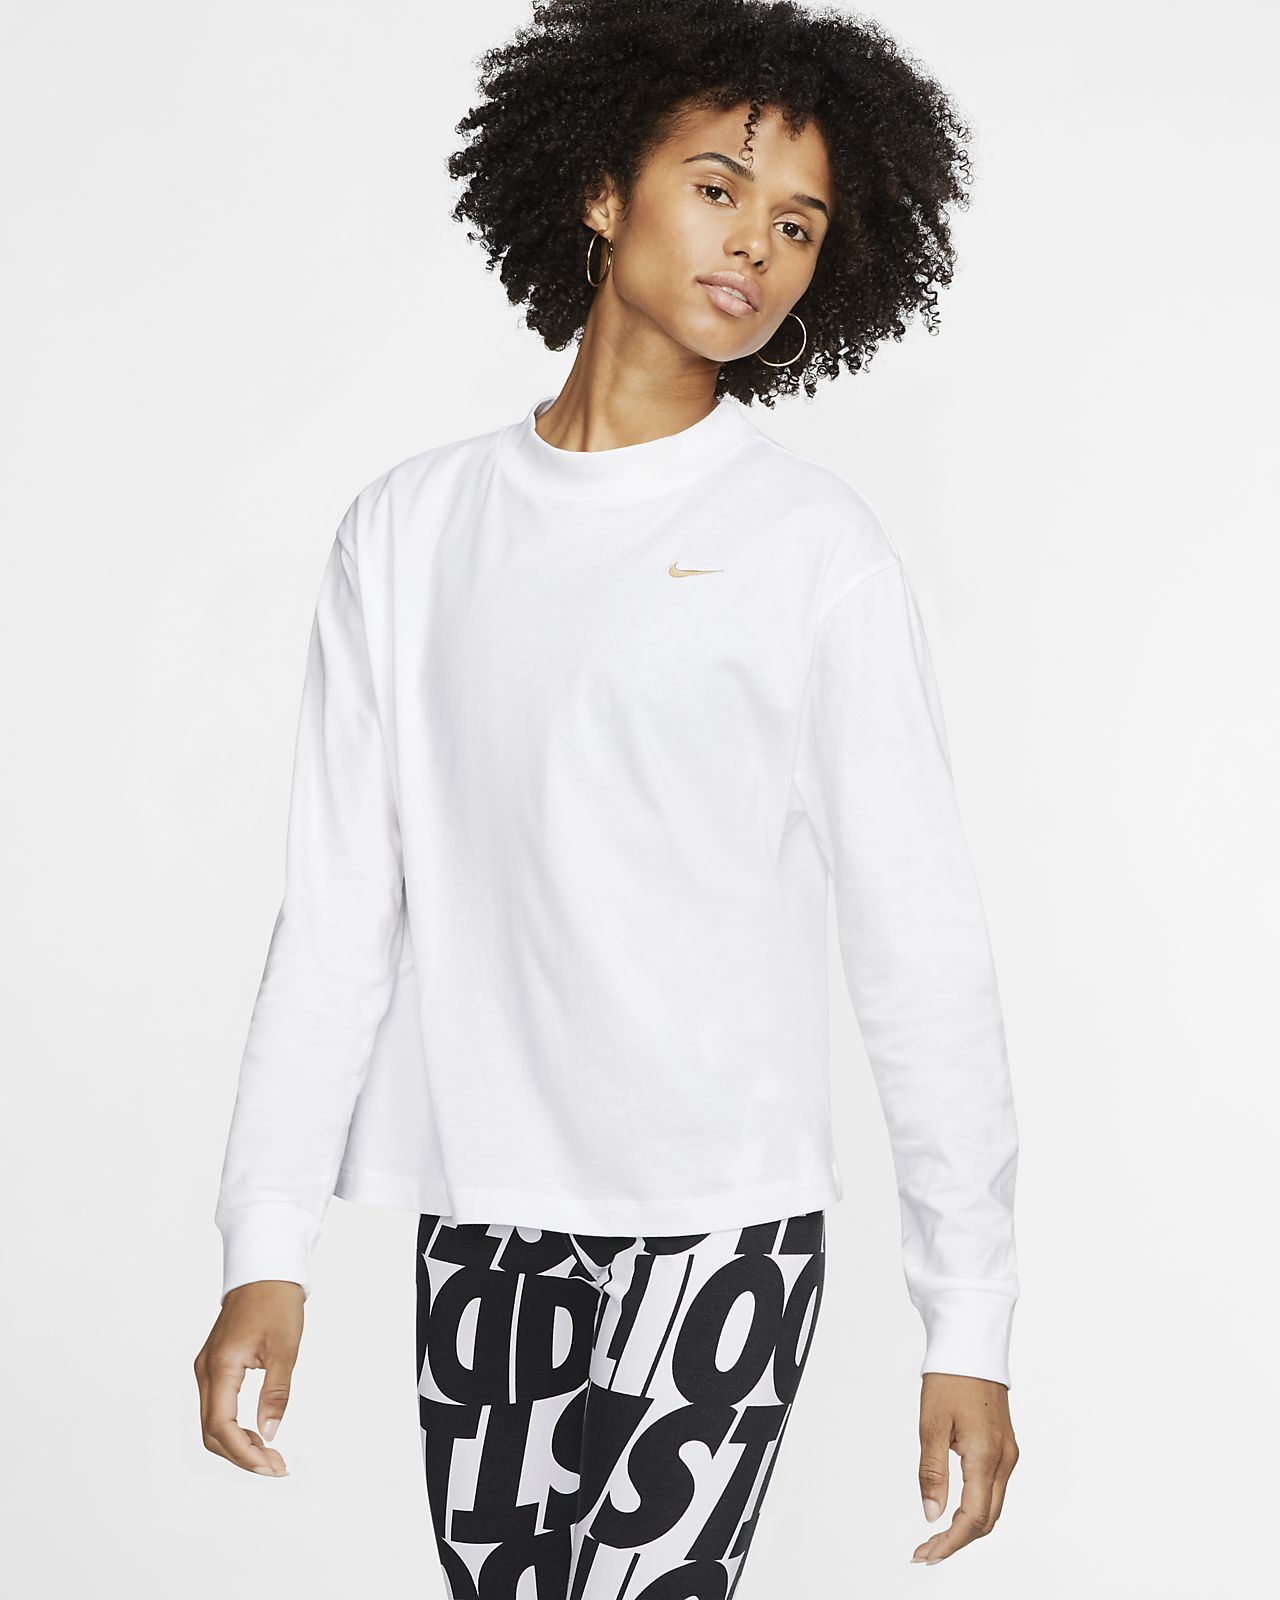 Långärmad tröja Nike Sportswear Essential för kvinnor